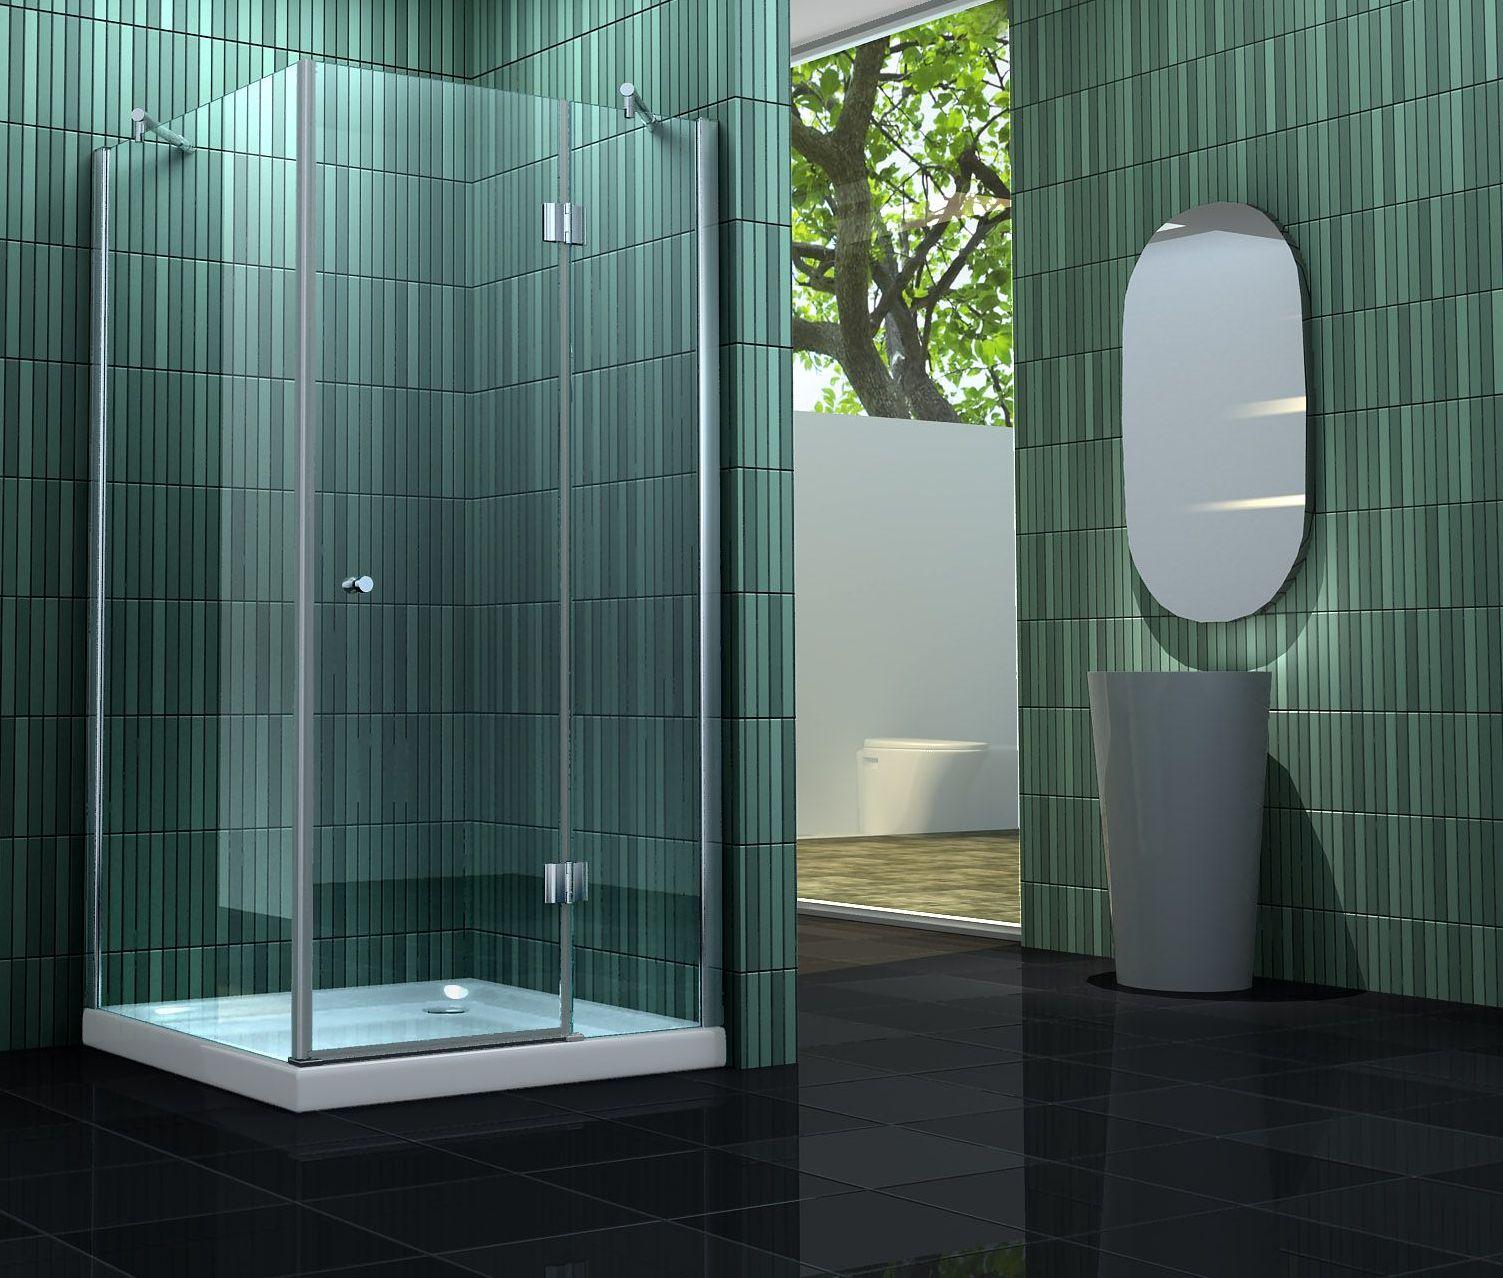 Sehr Gut Duschkabine SILL 90 x 90 x 170 cm ohne Duschtasse JH97